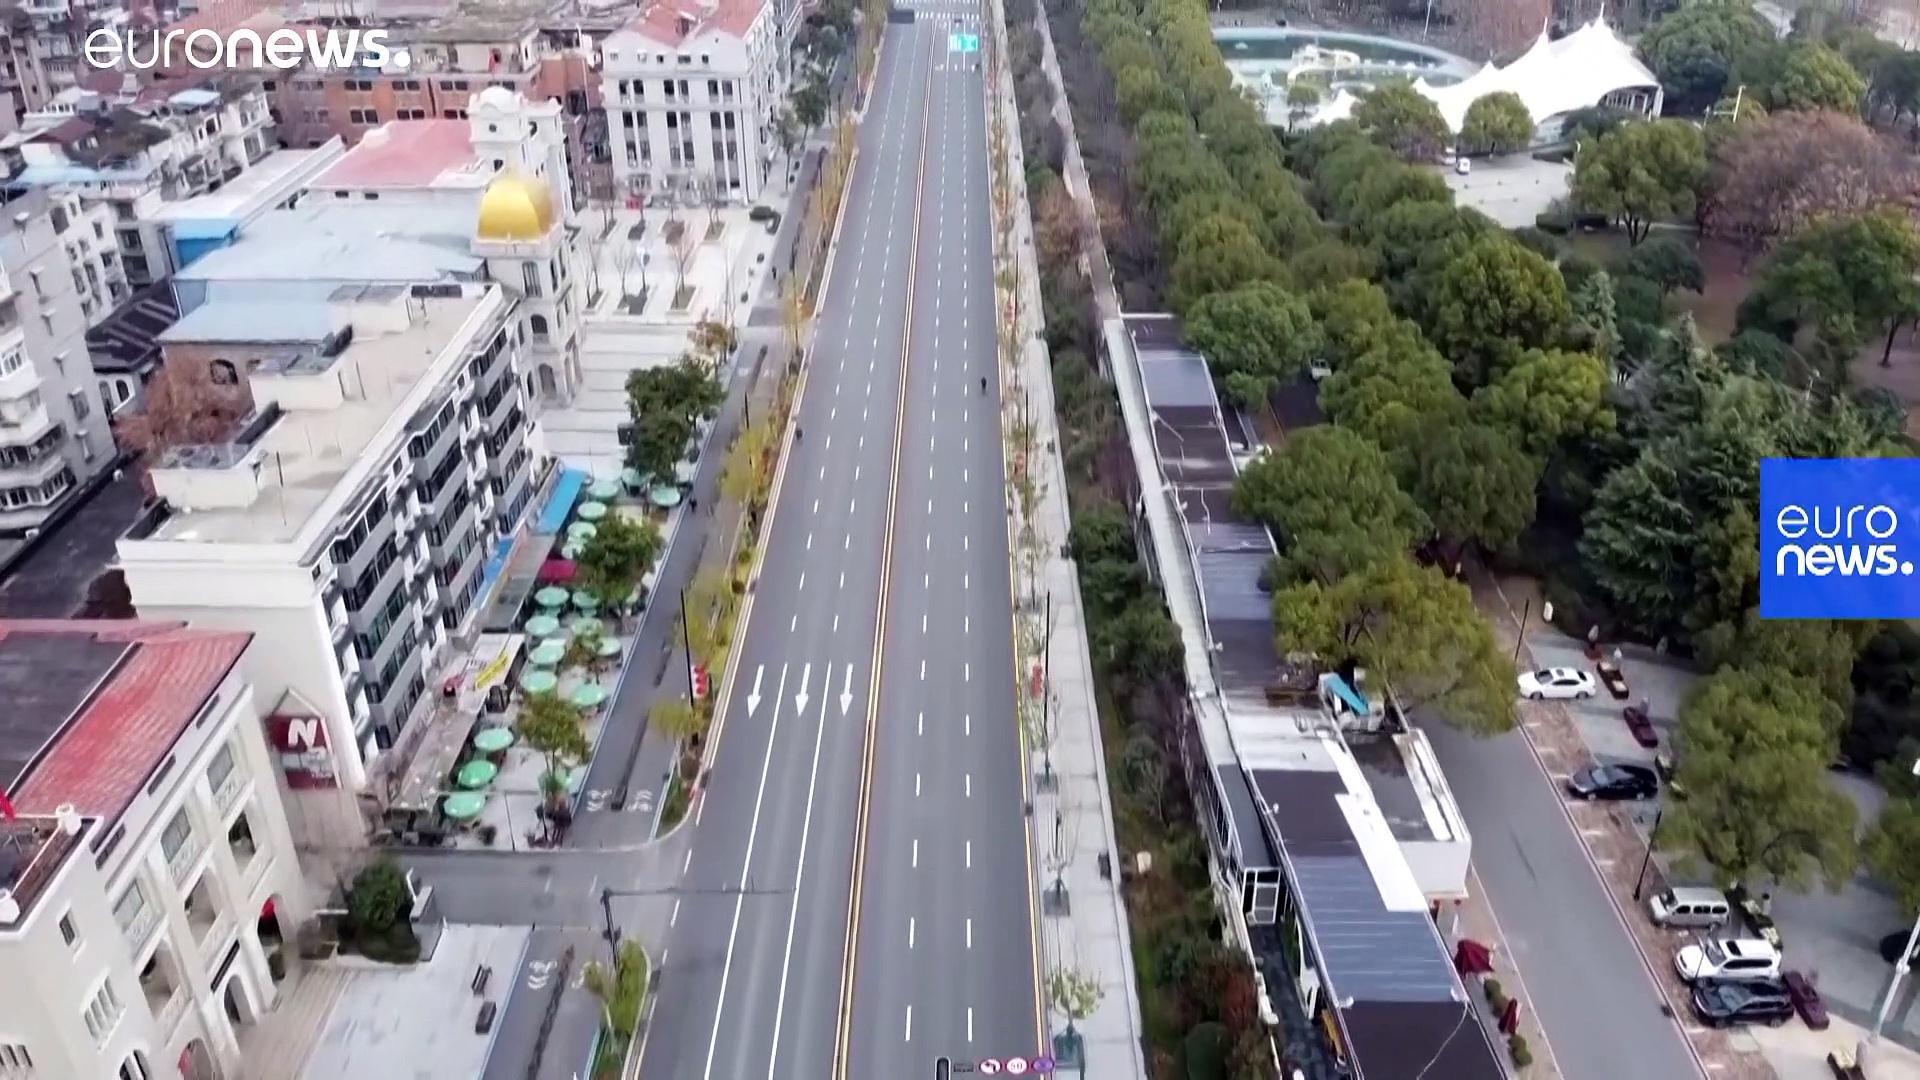 Coronavirus: le immagini di Wuhan, (strategica) città fantasma da 11 milioni di abitanti